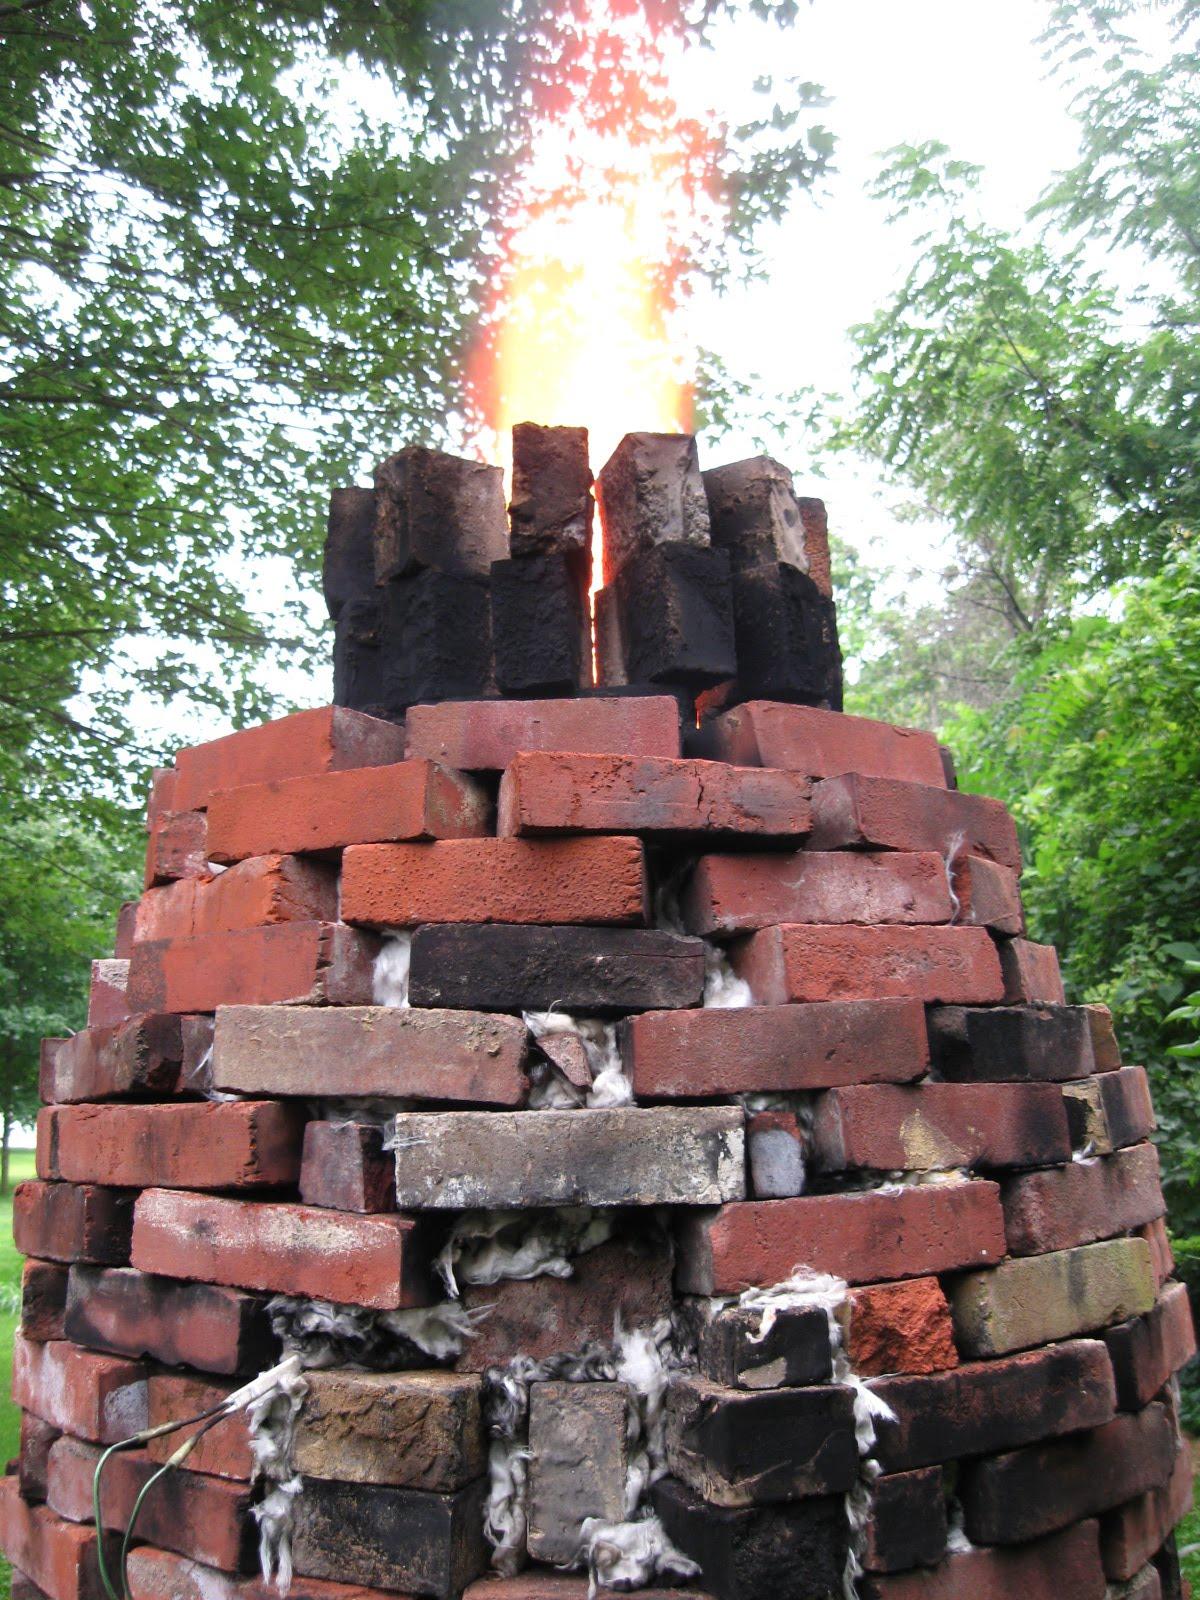 How Do You Make Clay Bricks : Make your own bricks august